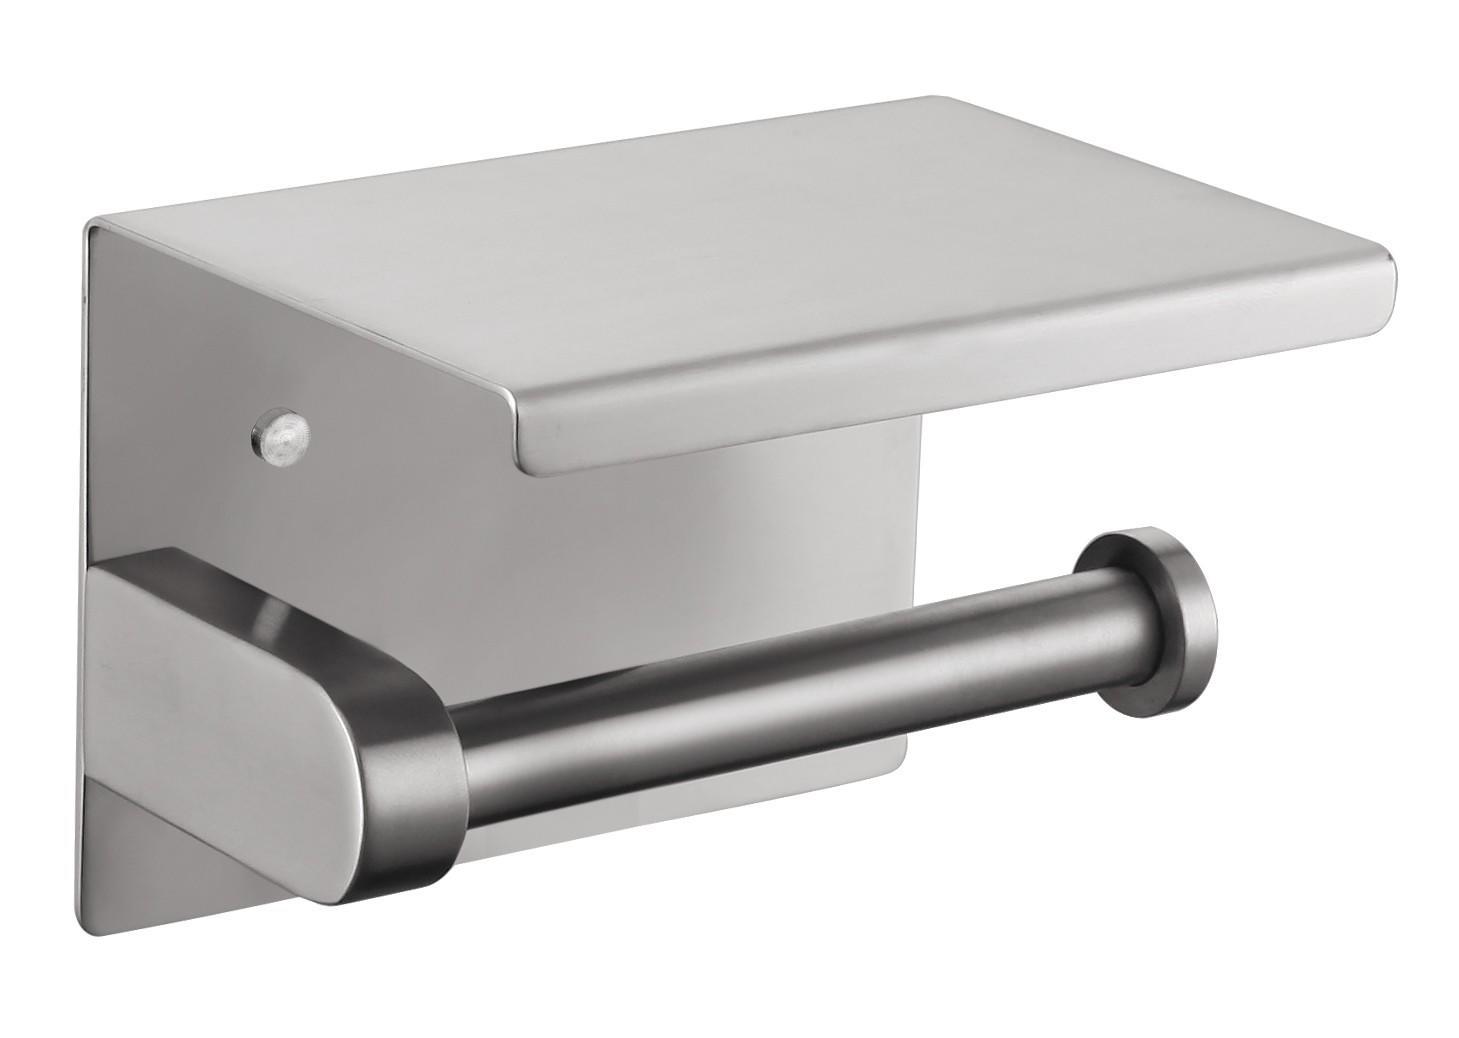 Norye stainless steel paper towel dispenser manufacturer for washroom-1